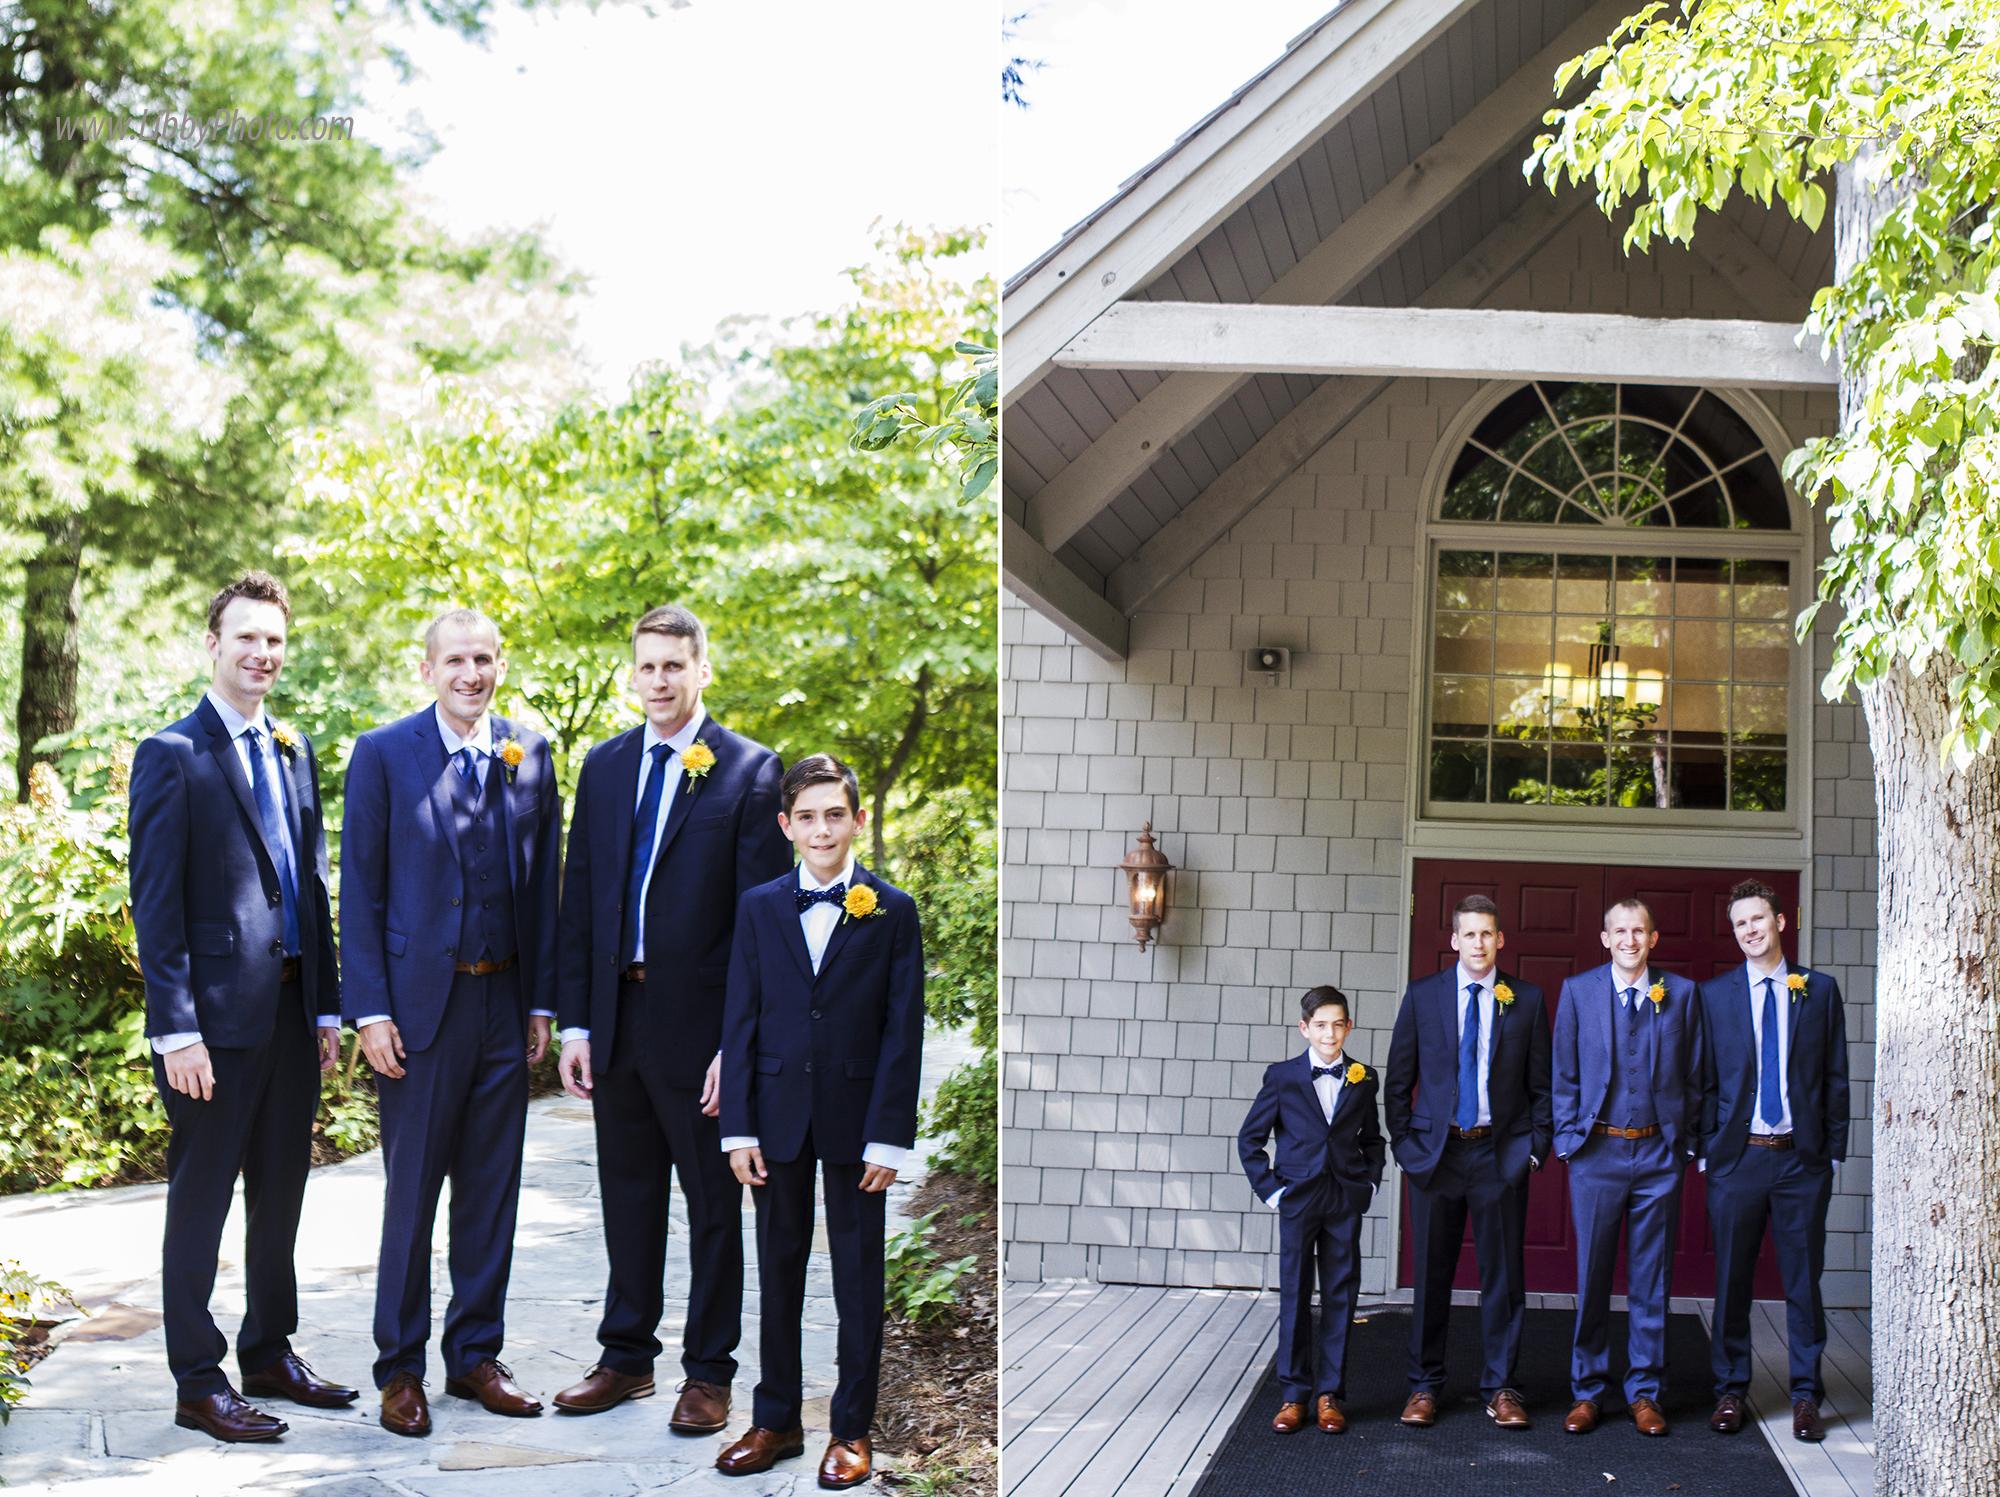 Atlanta wedding photography, Libbyphoto11 (26).jpg